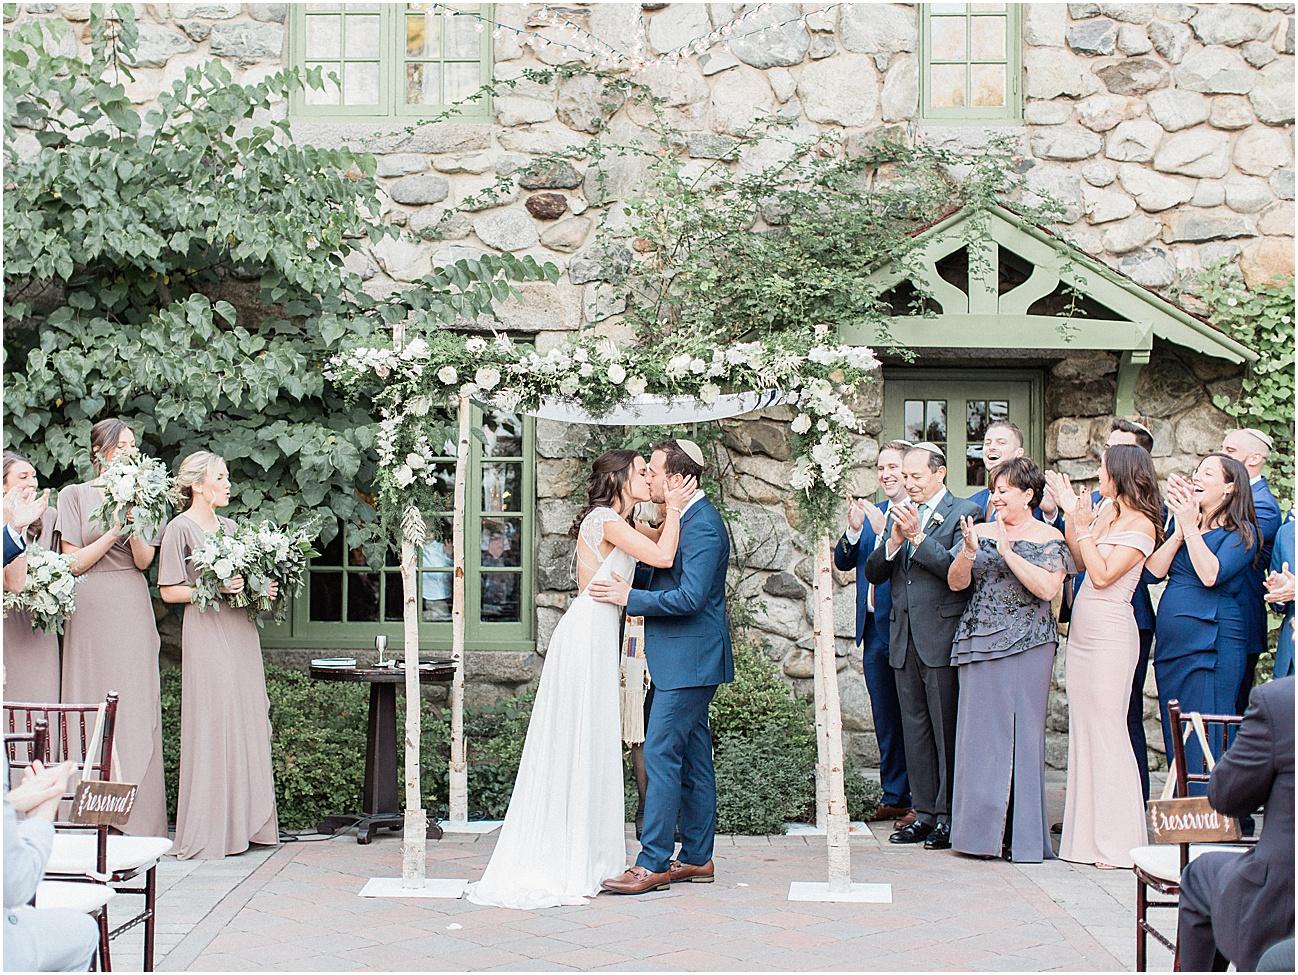 jenna_mike_willowdale_estate_topsfield_neutral_whites_greens_fall_cape_cod_boston_wedding_photographer_meredith_jane_photography_photo_1450.jpg